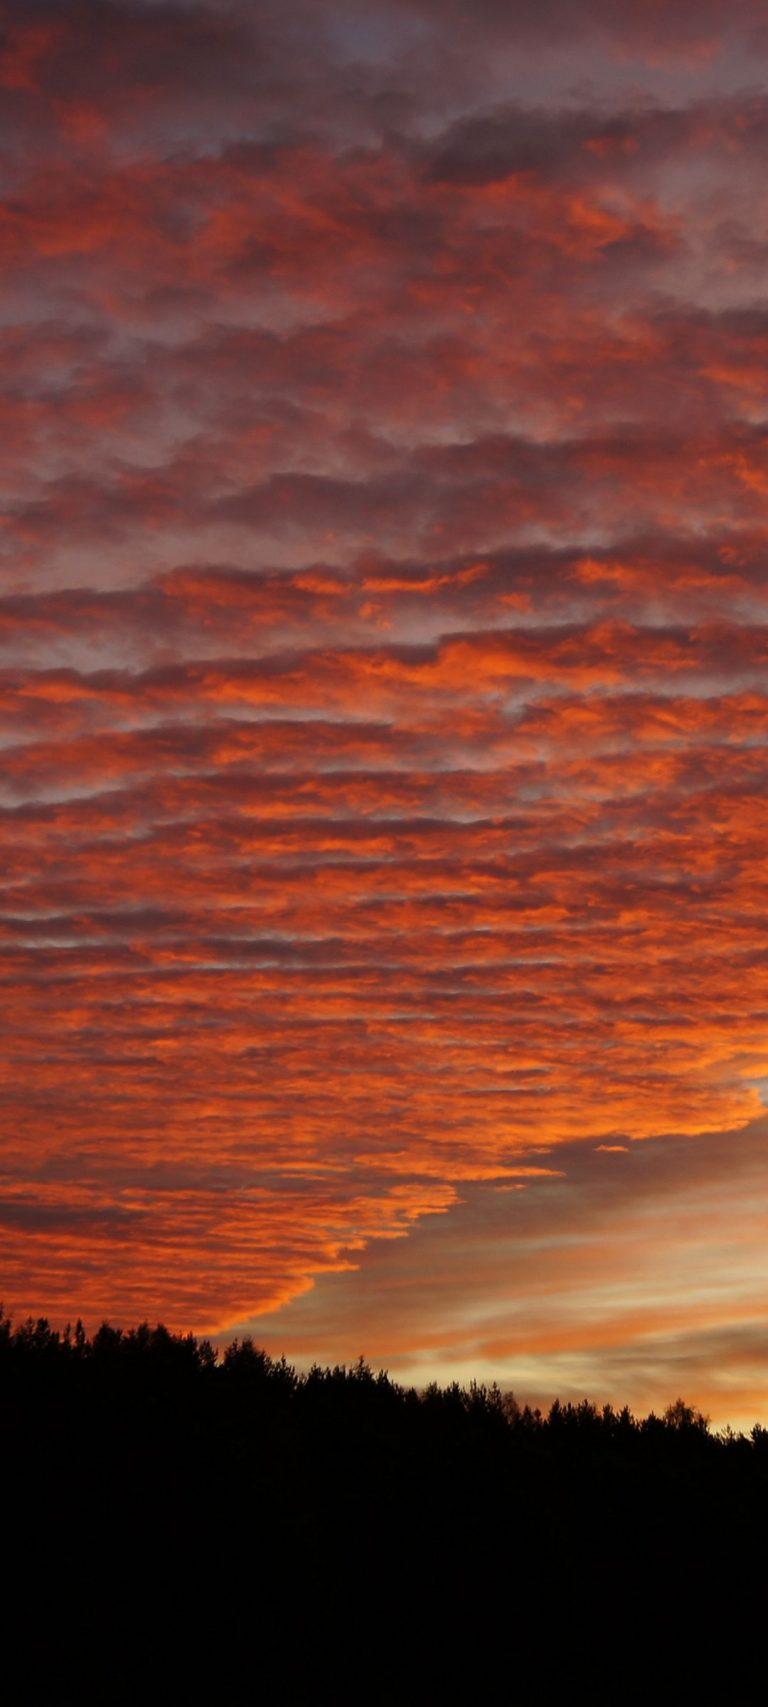 Sky Clouds Sunset Beautiful 1080x2400 768x1707